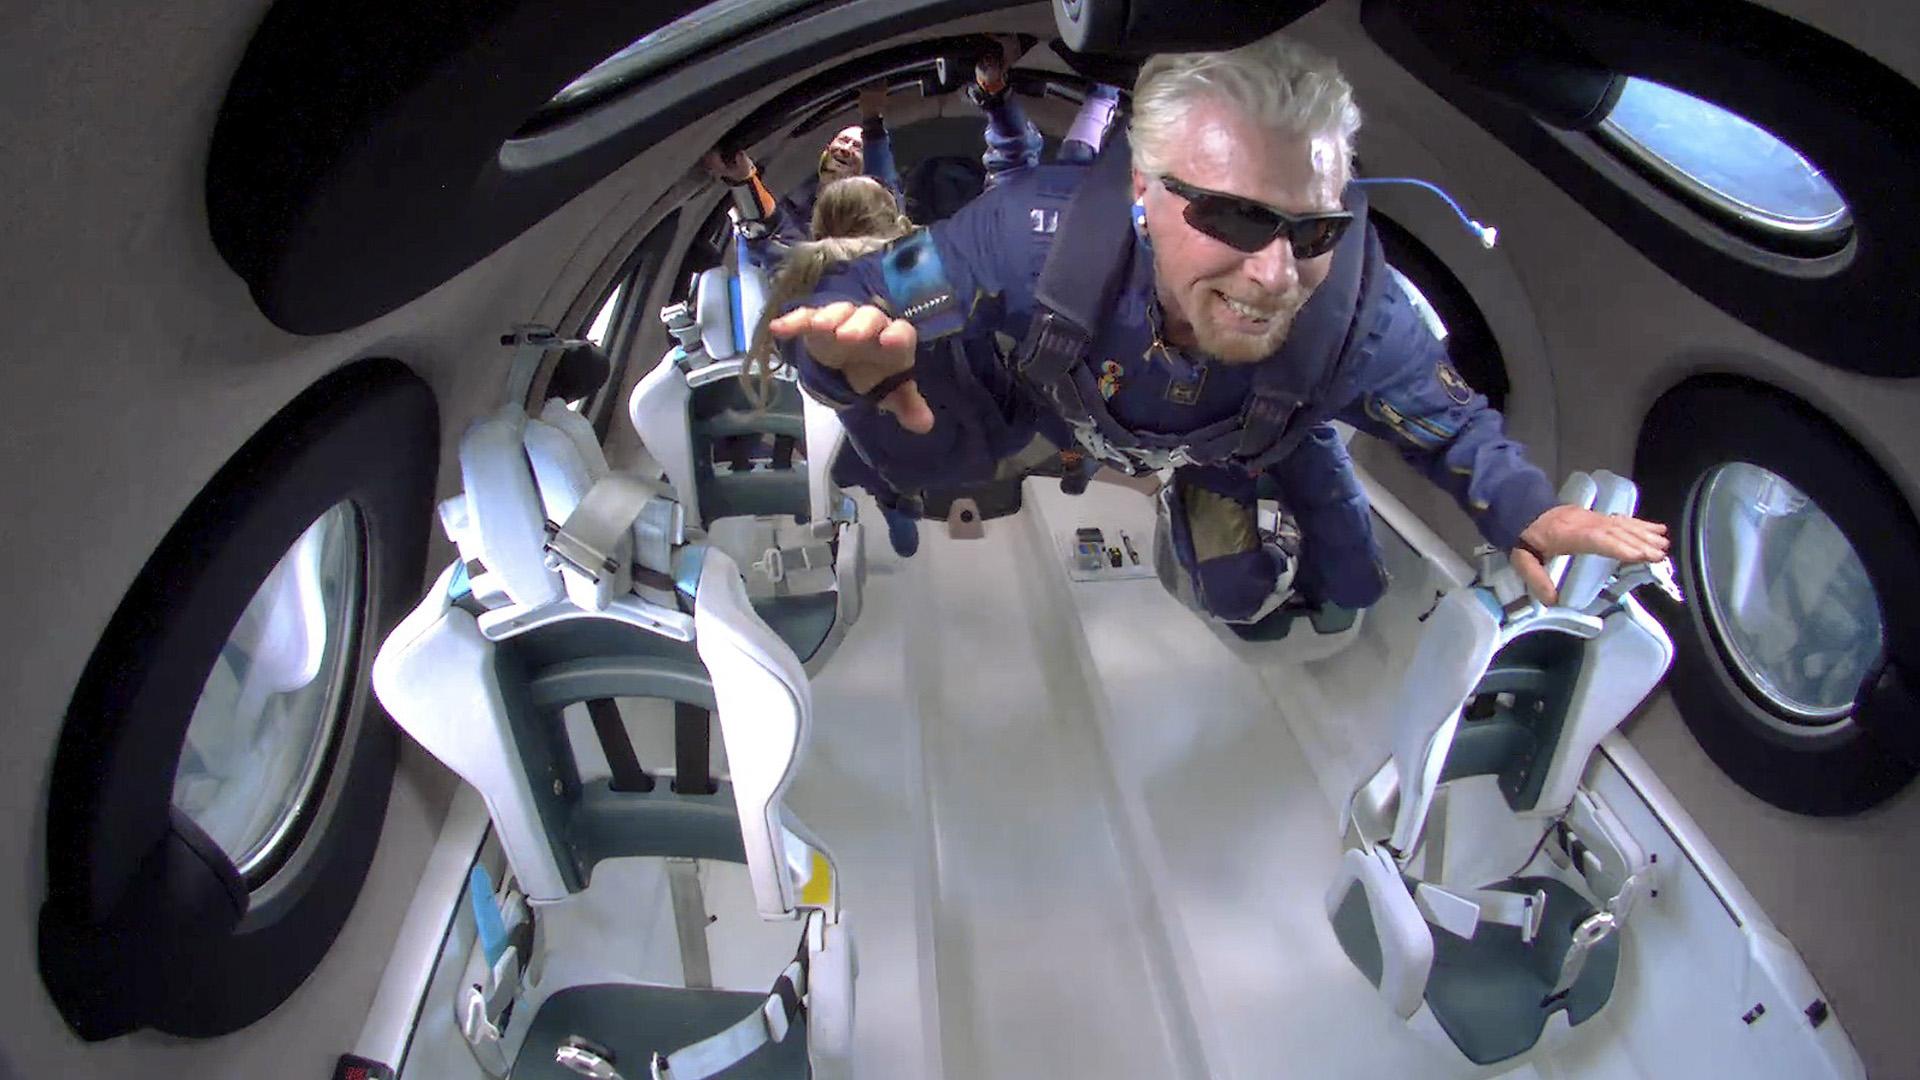 Virgin Galactic Spaceship Returns With Branson, Crew